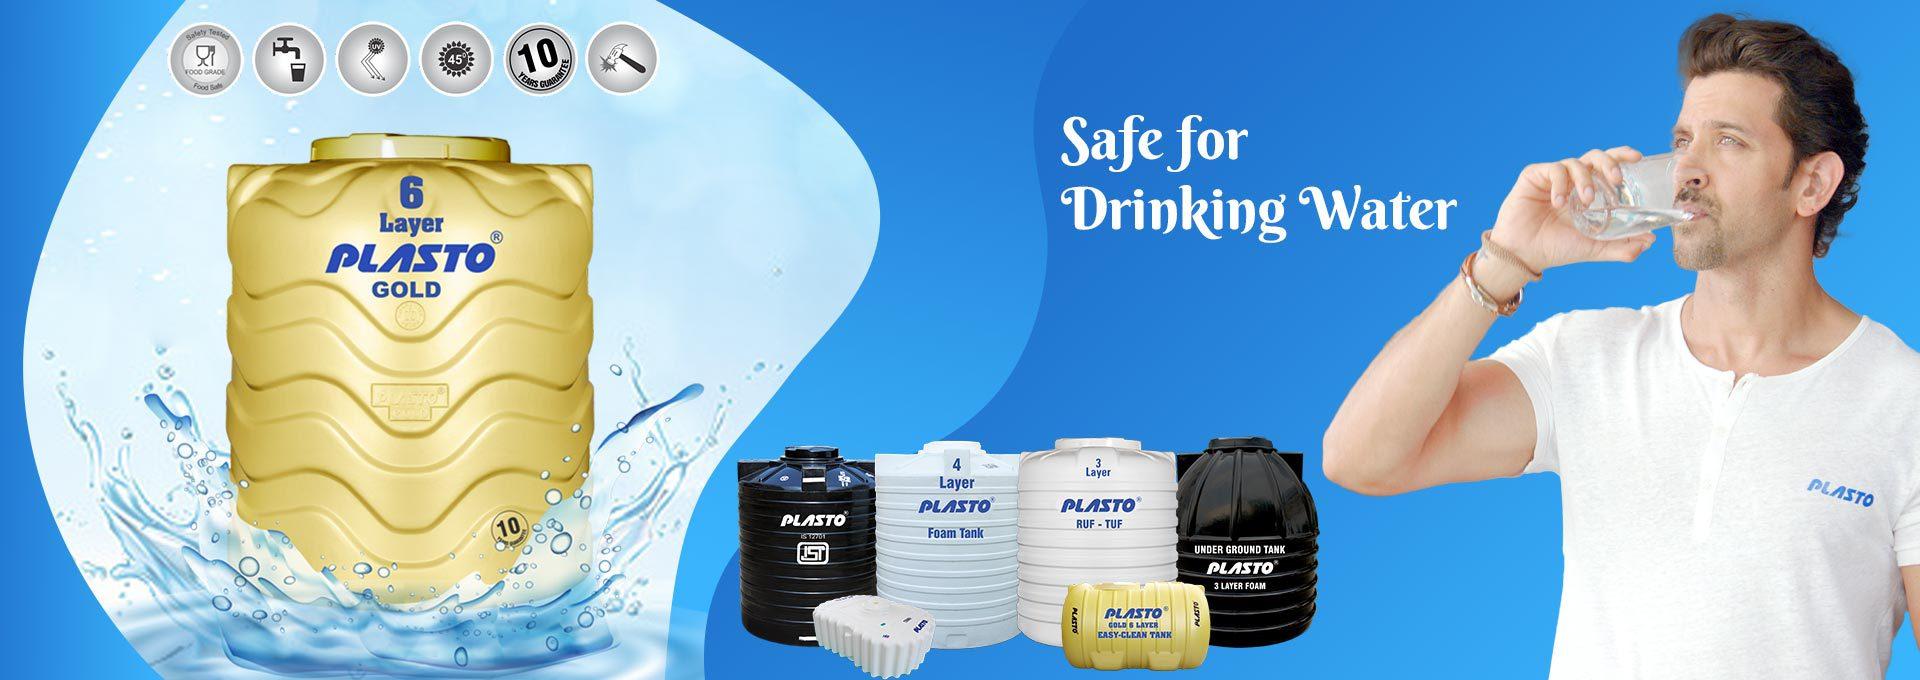 Web-banner-water-tank-plasto